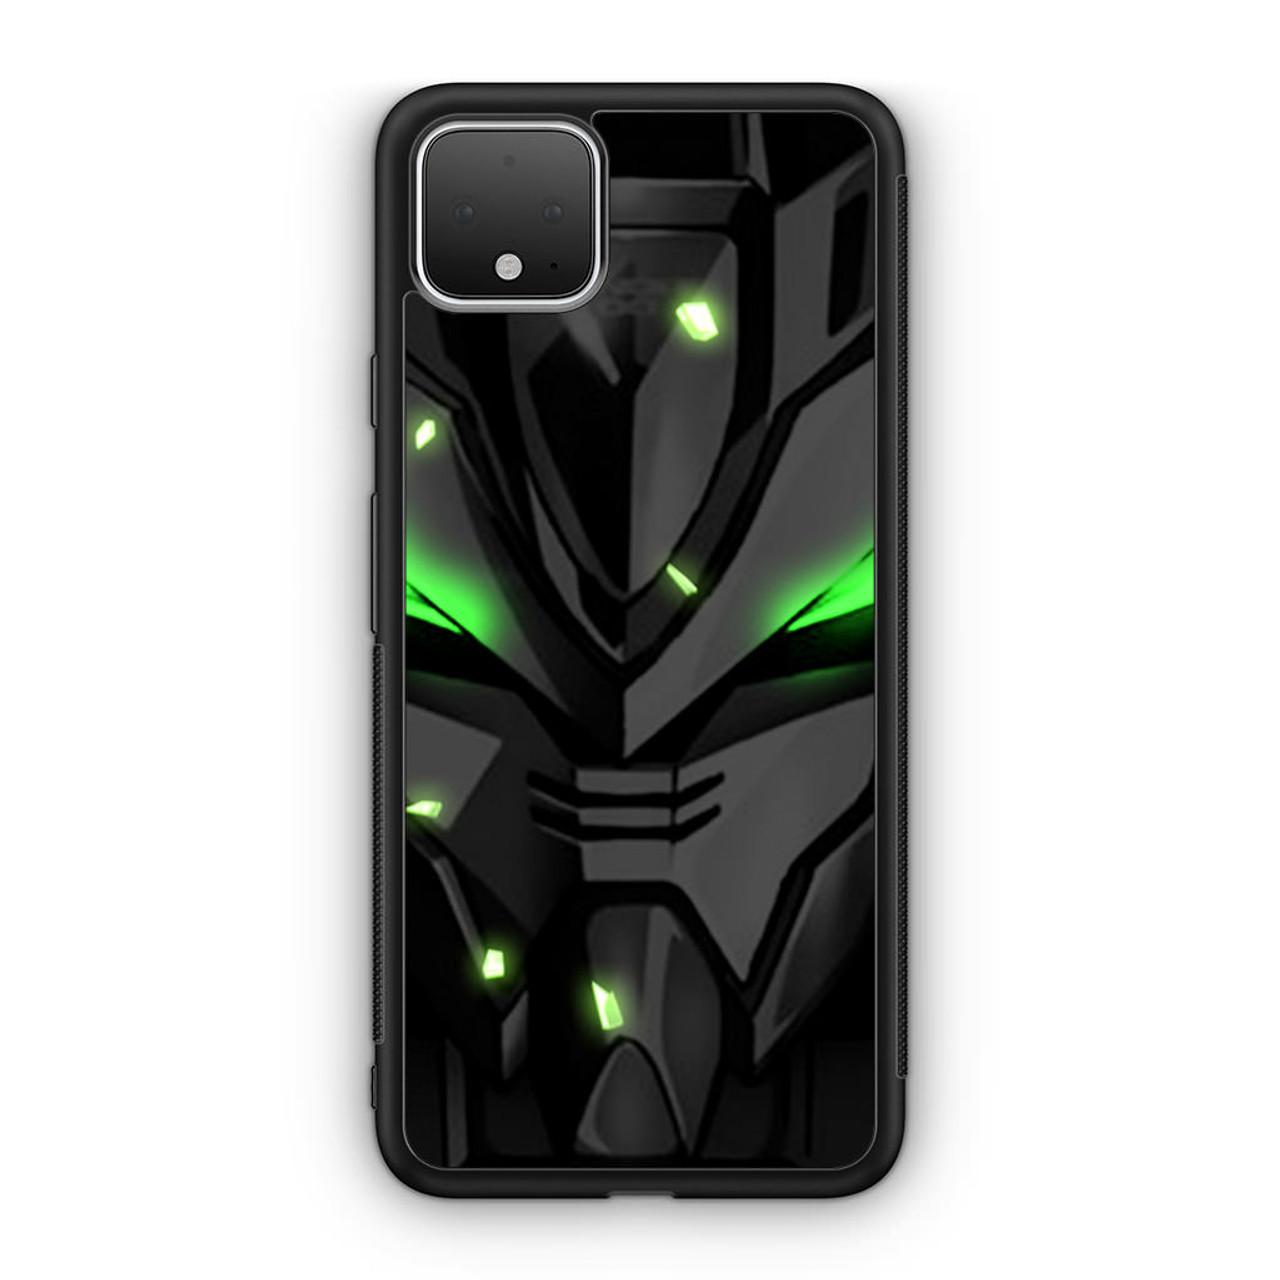 Gundam 5 cases //// New iphone case samsung case lg case